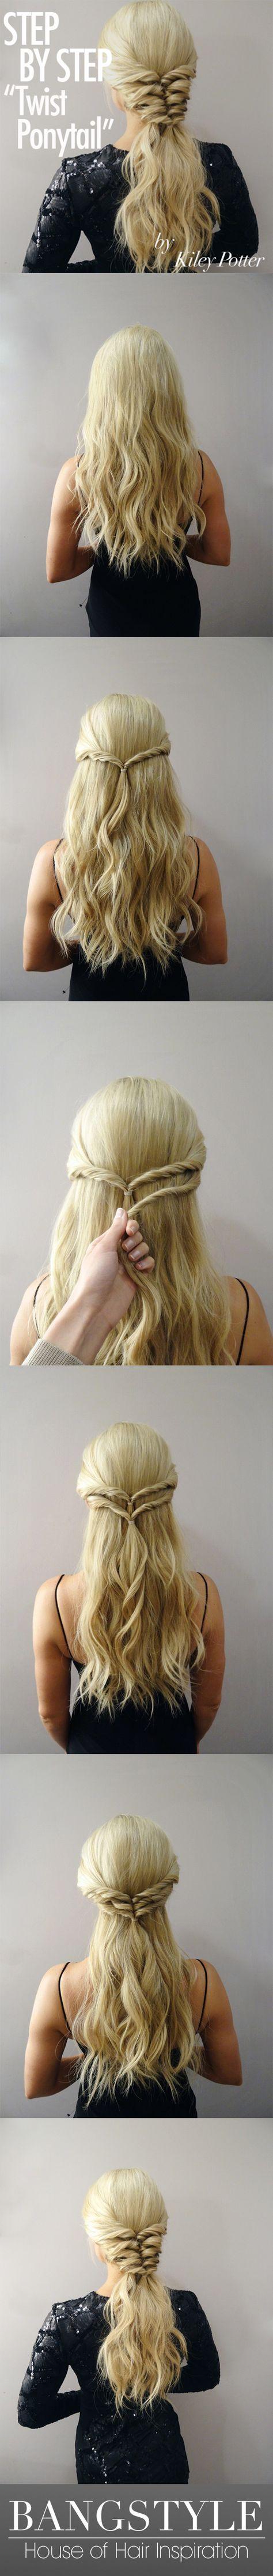 . Learn How To Grow Luscious Long Sexy Hair @ longhairtips.org/ #longhair #longhairstyles #longhairtips